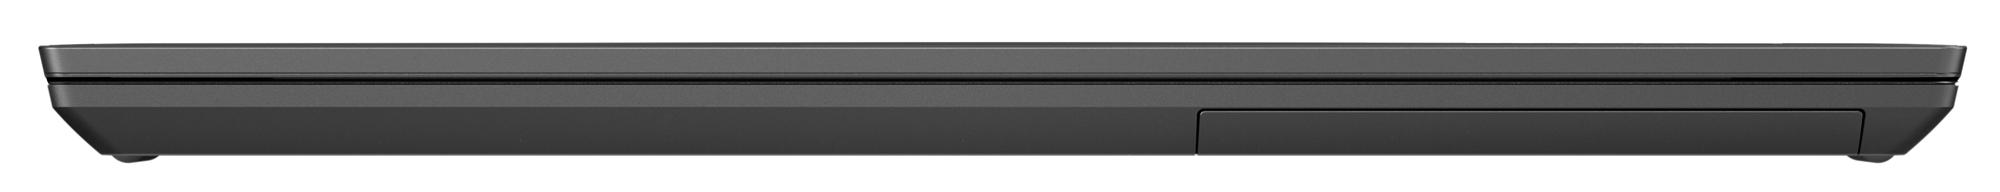 Фото  Ноутбук Lenovo V330-14 Grey (81B00088UA)